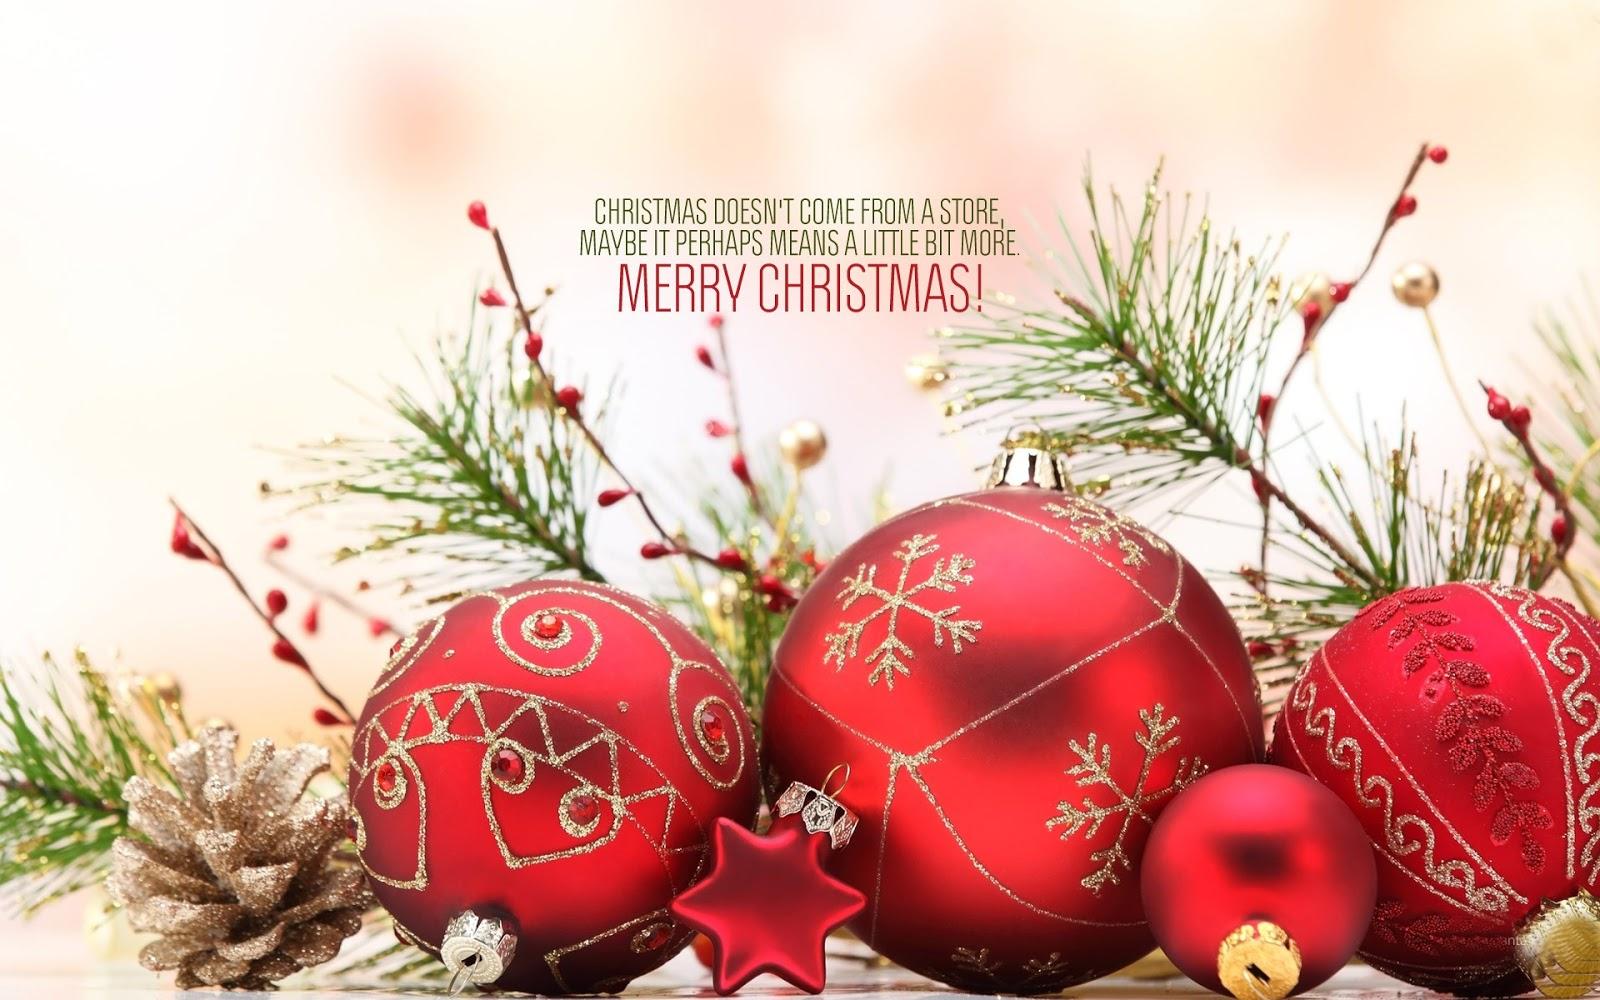 Kumpulan Dp BBM Natal Merry Christmas Pohon Natal 2017 2018